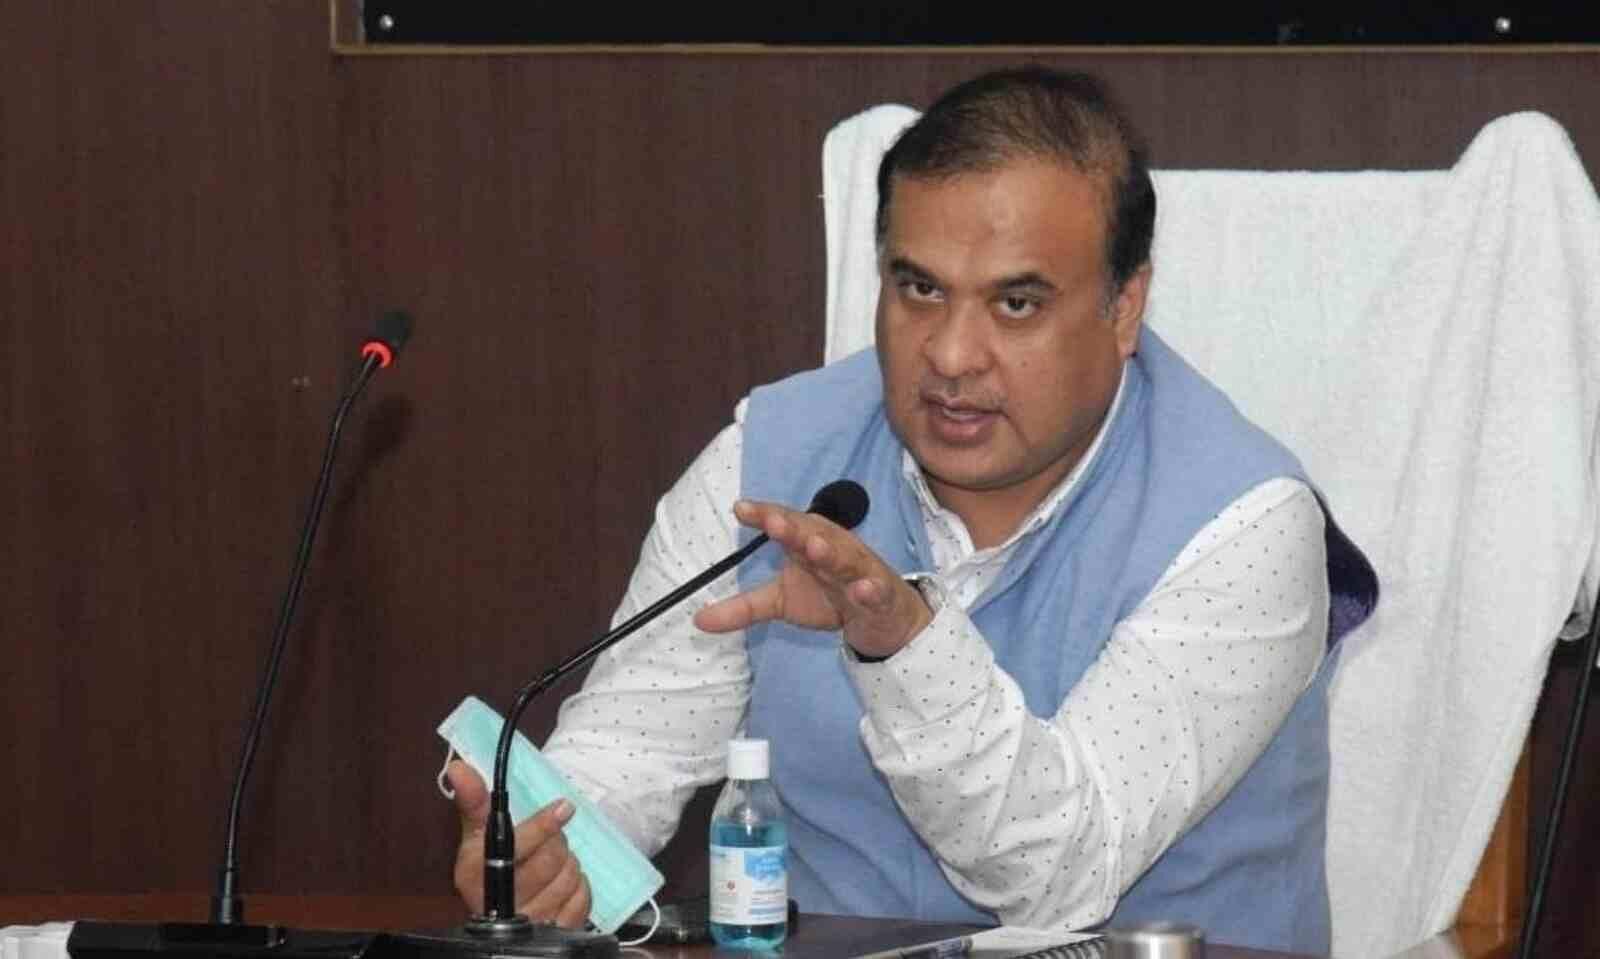 TNPSC Daily Current Affairs-Assam CM Himanta Biswa assures govt jobs for National Games Medalists | அஸ்ஸாம் முதல்வர் ஹிமந்தா பிஸ்வா தேசிய விளையாட்டு பதக்கம் வென்றவர்களுக்கு அரசு வேலை என உறுதி அளித்தார் |_40.1